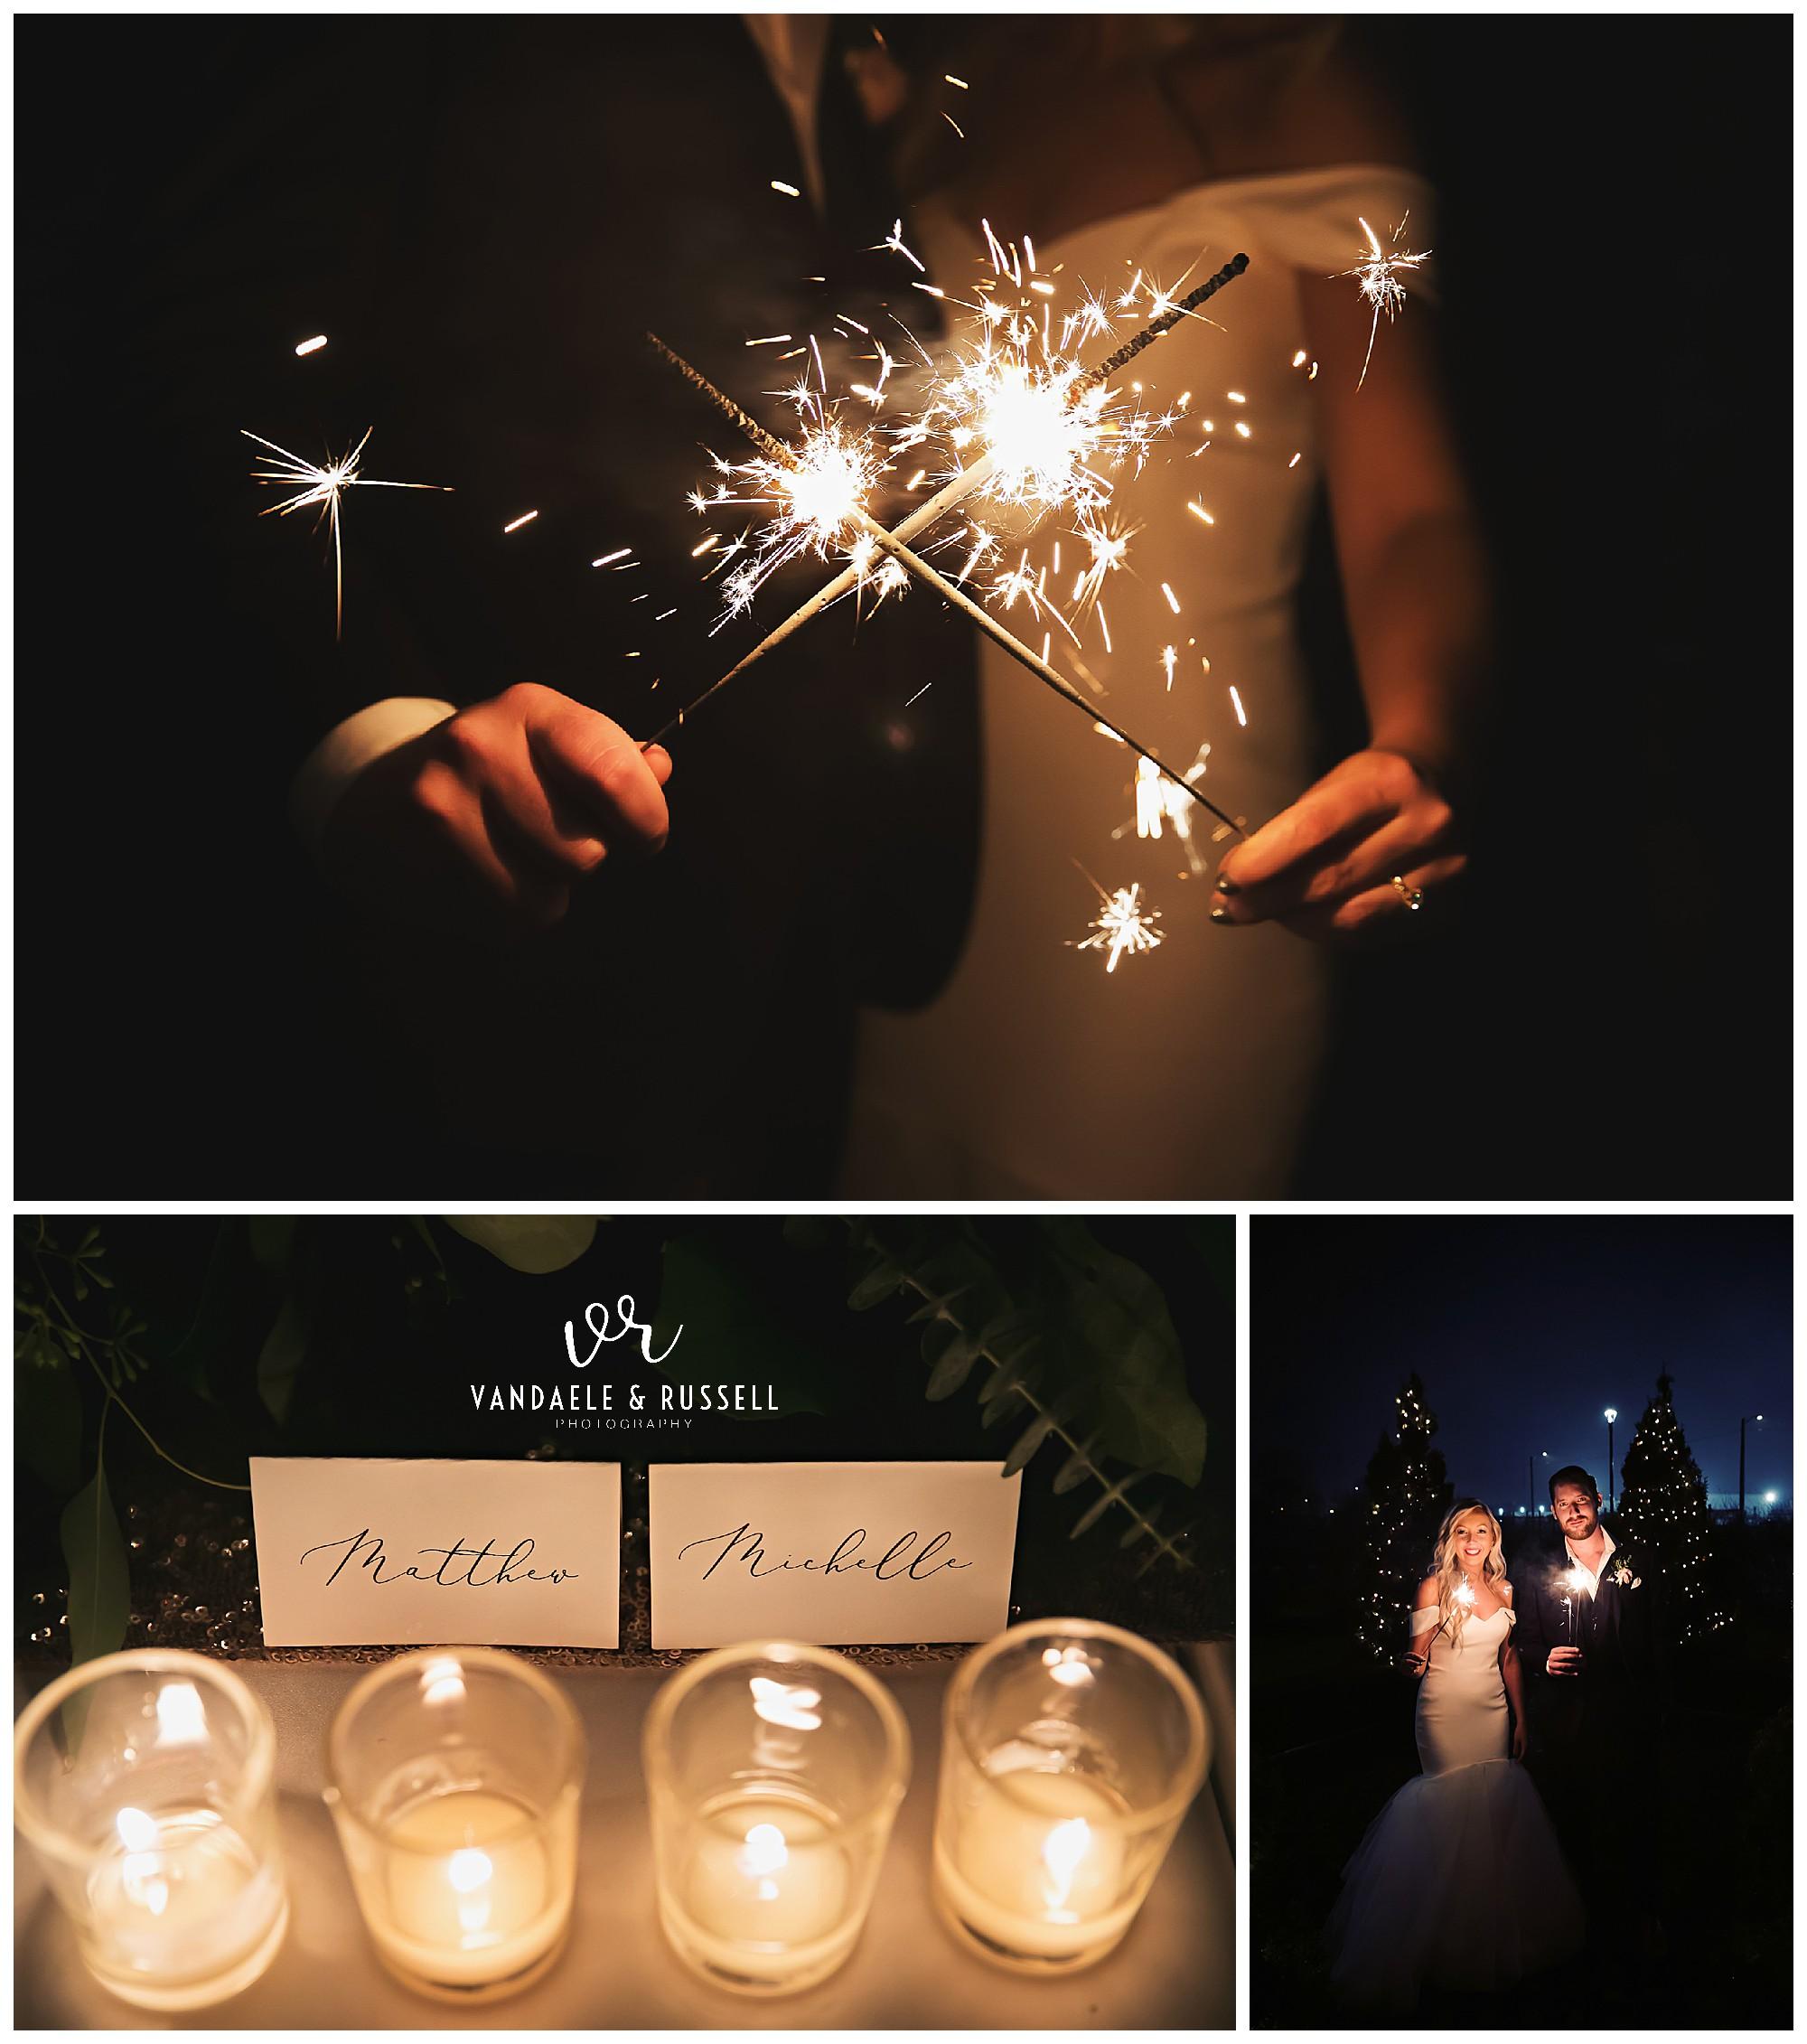 Hacienda-Sarria-Wedding-Photos-NYE-Michelle-Matt-VanDaele-Russell_0046.jpg